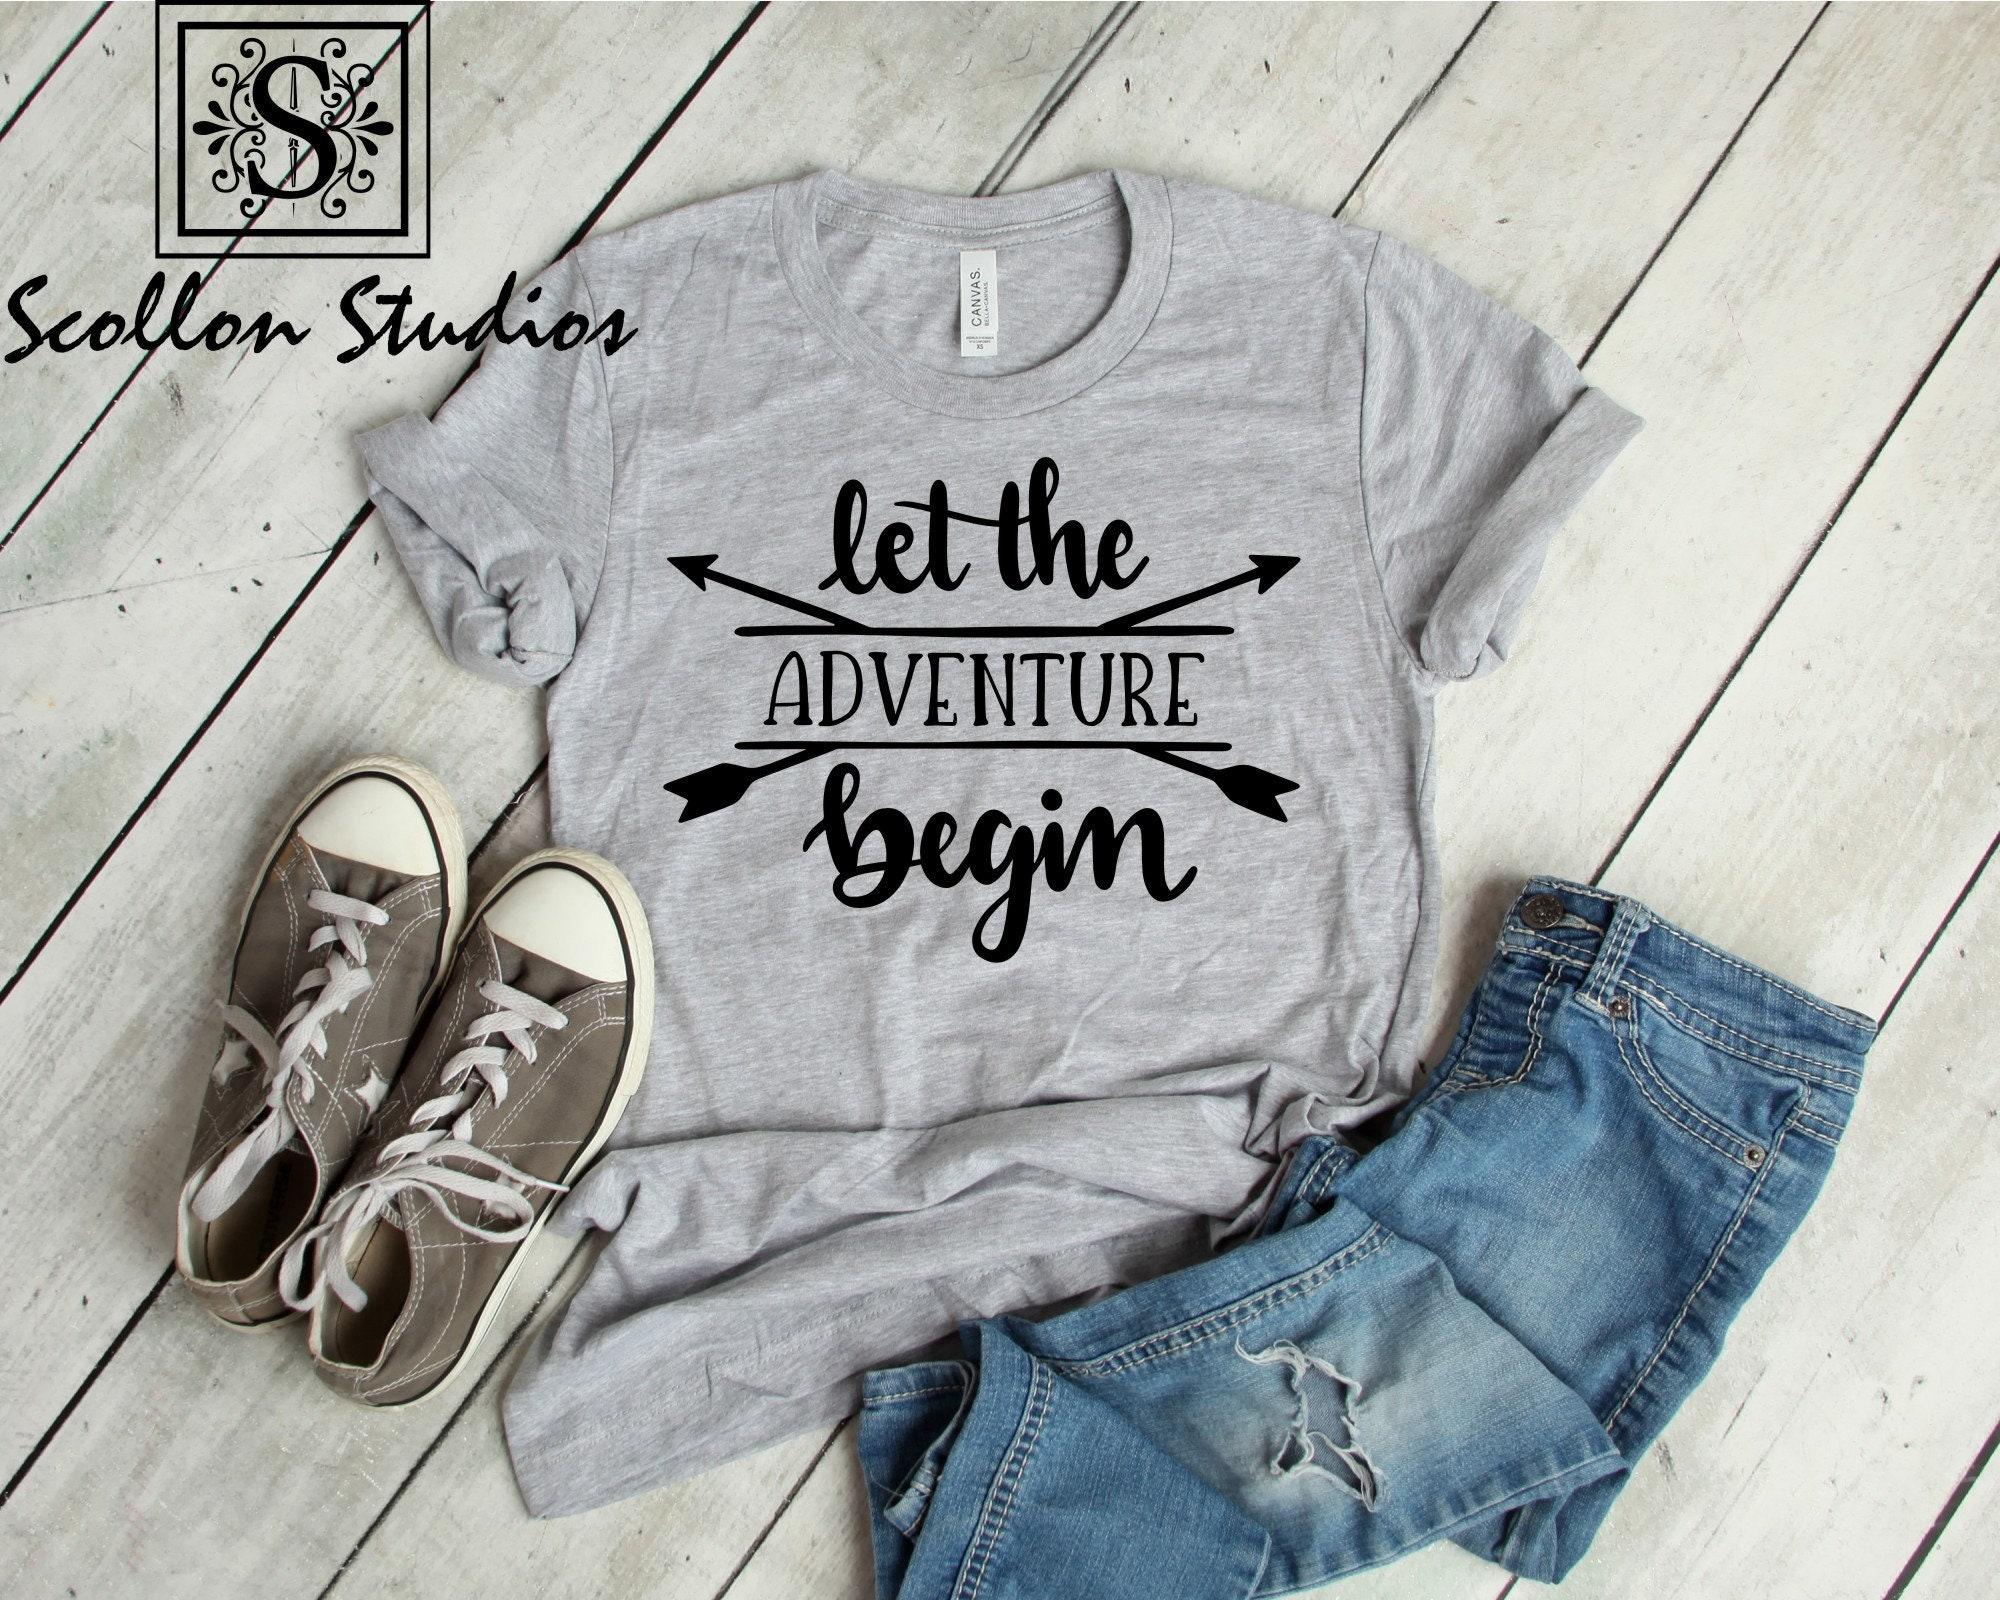 c97efd3a4ffa Let The Adventure Begin | Unisex Jersey Short Sleeve T- Shirt |Let The  Adventure Begin Tee | Adventure T-Shirt | Unisex Sized T-shirt